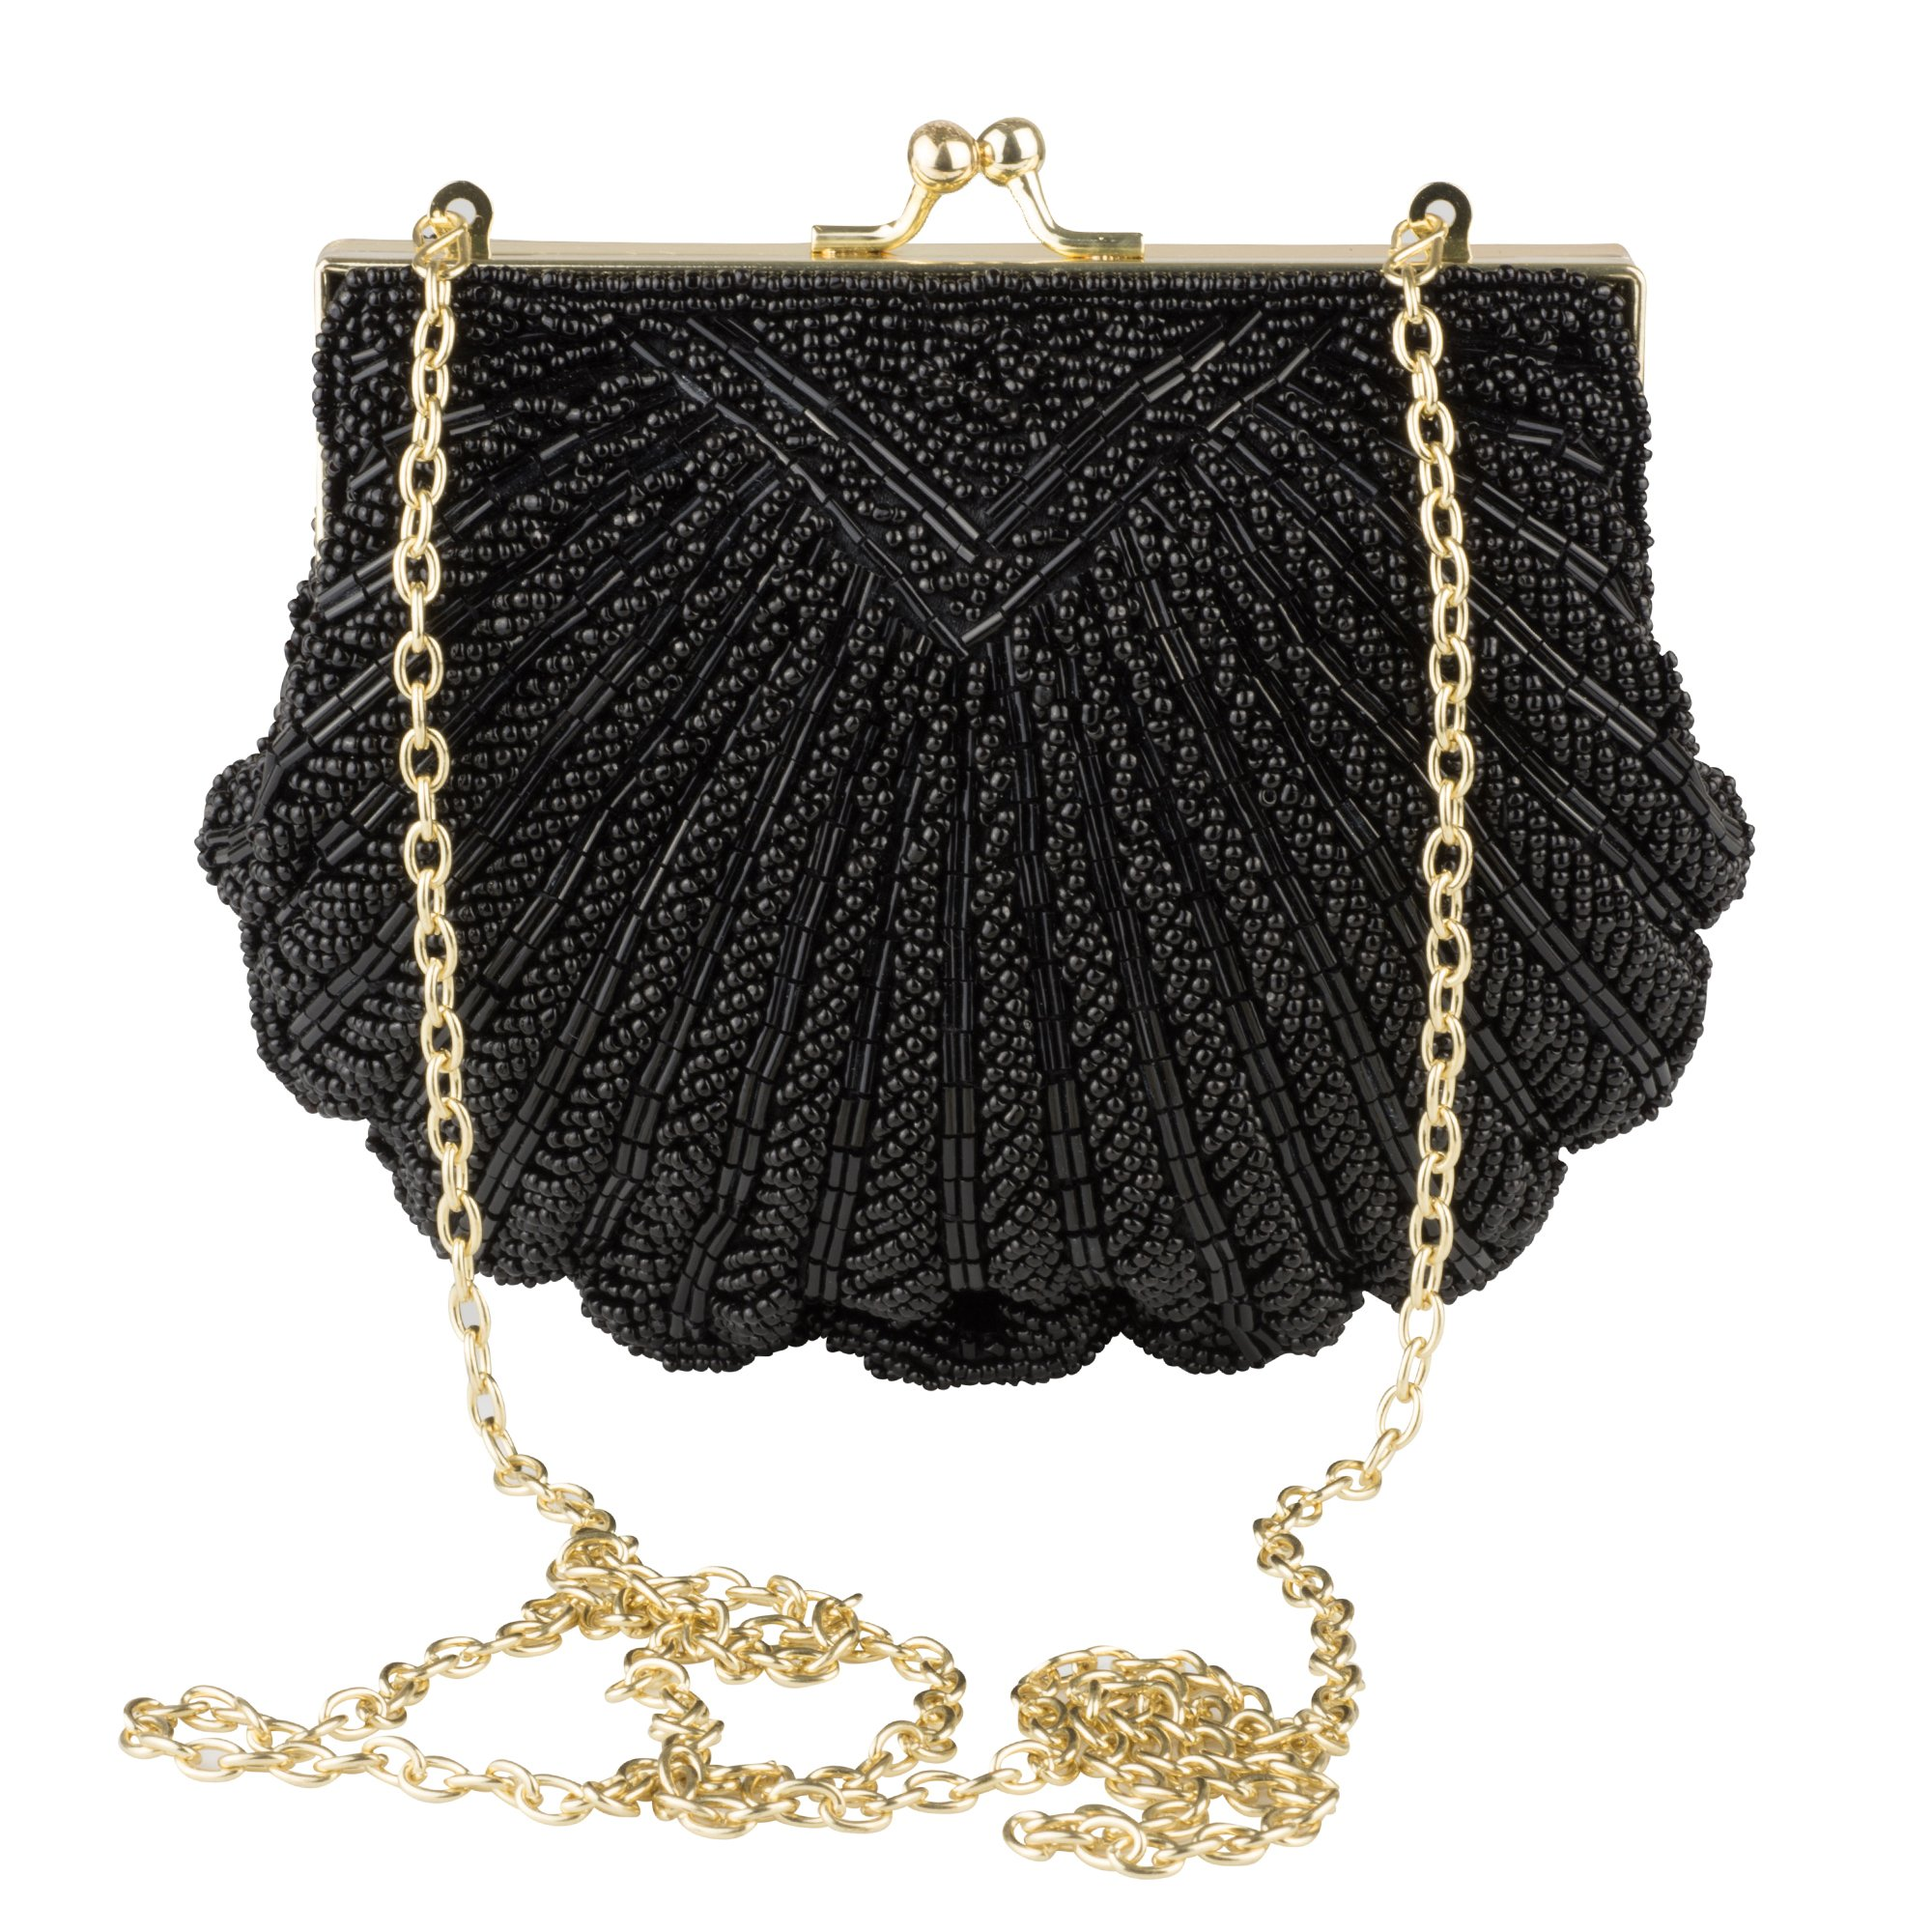 La Regale Evening Clutch Handbag – Iconic Fully Beaded Sea Shell Purse